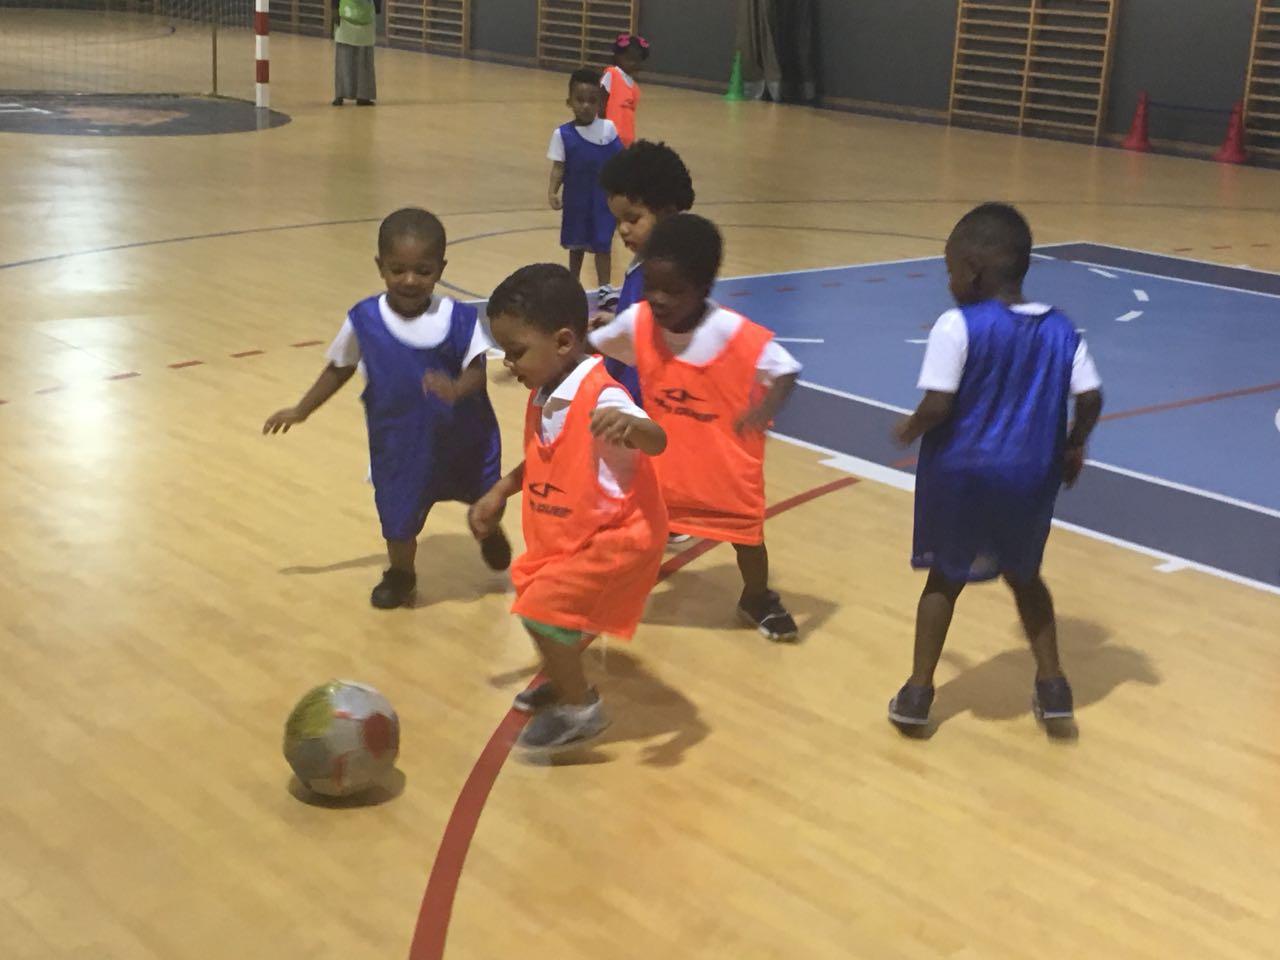 Jogo de Futebol Sub 9 entre equipa AECs do CAT vs Escola de Futebol Benfica CAJU 🗓 🗺